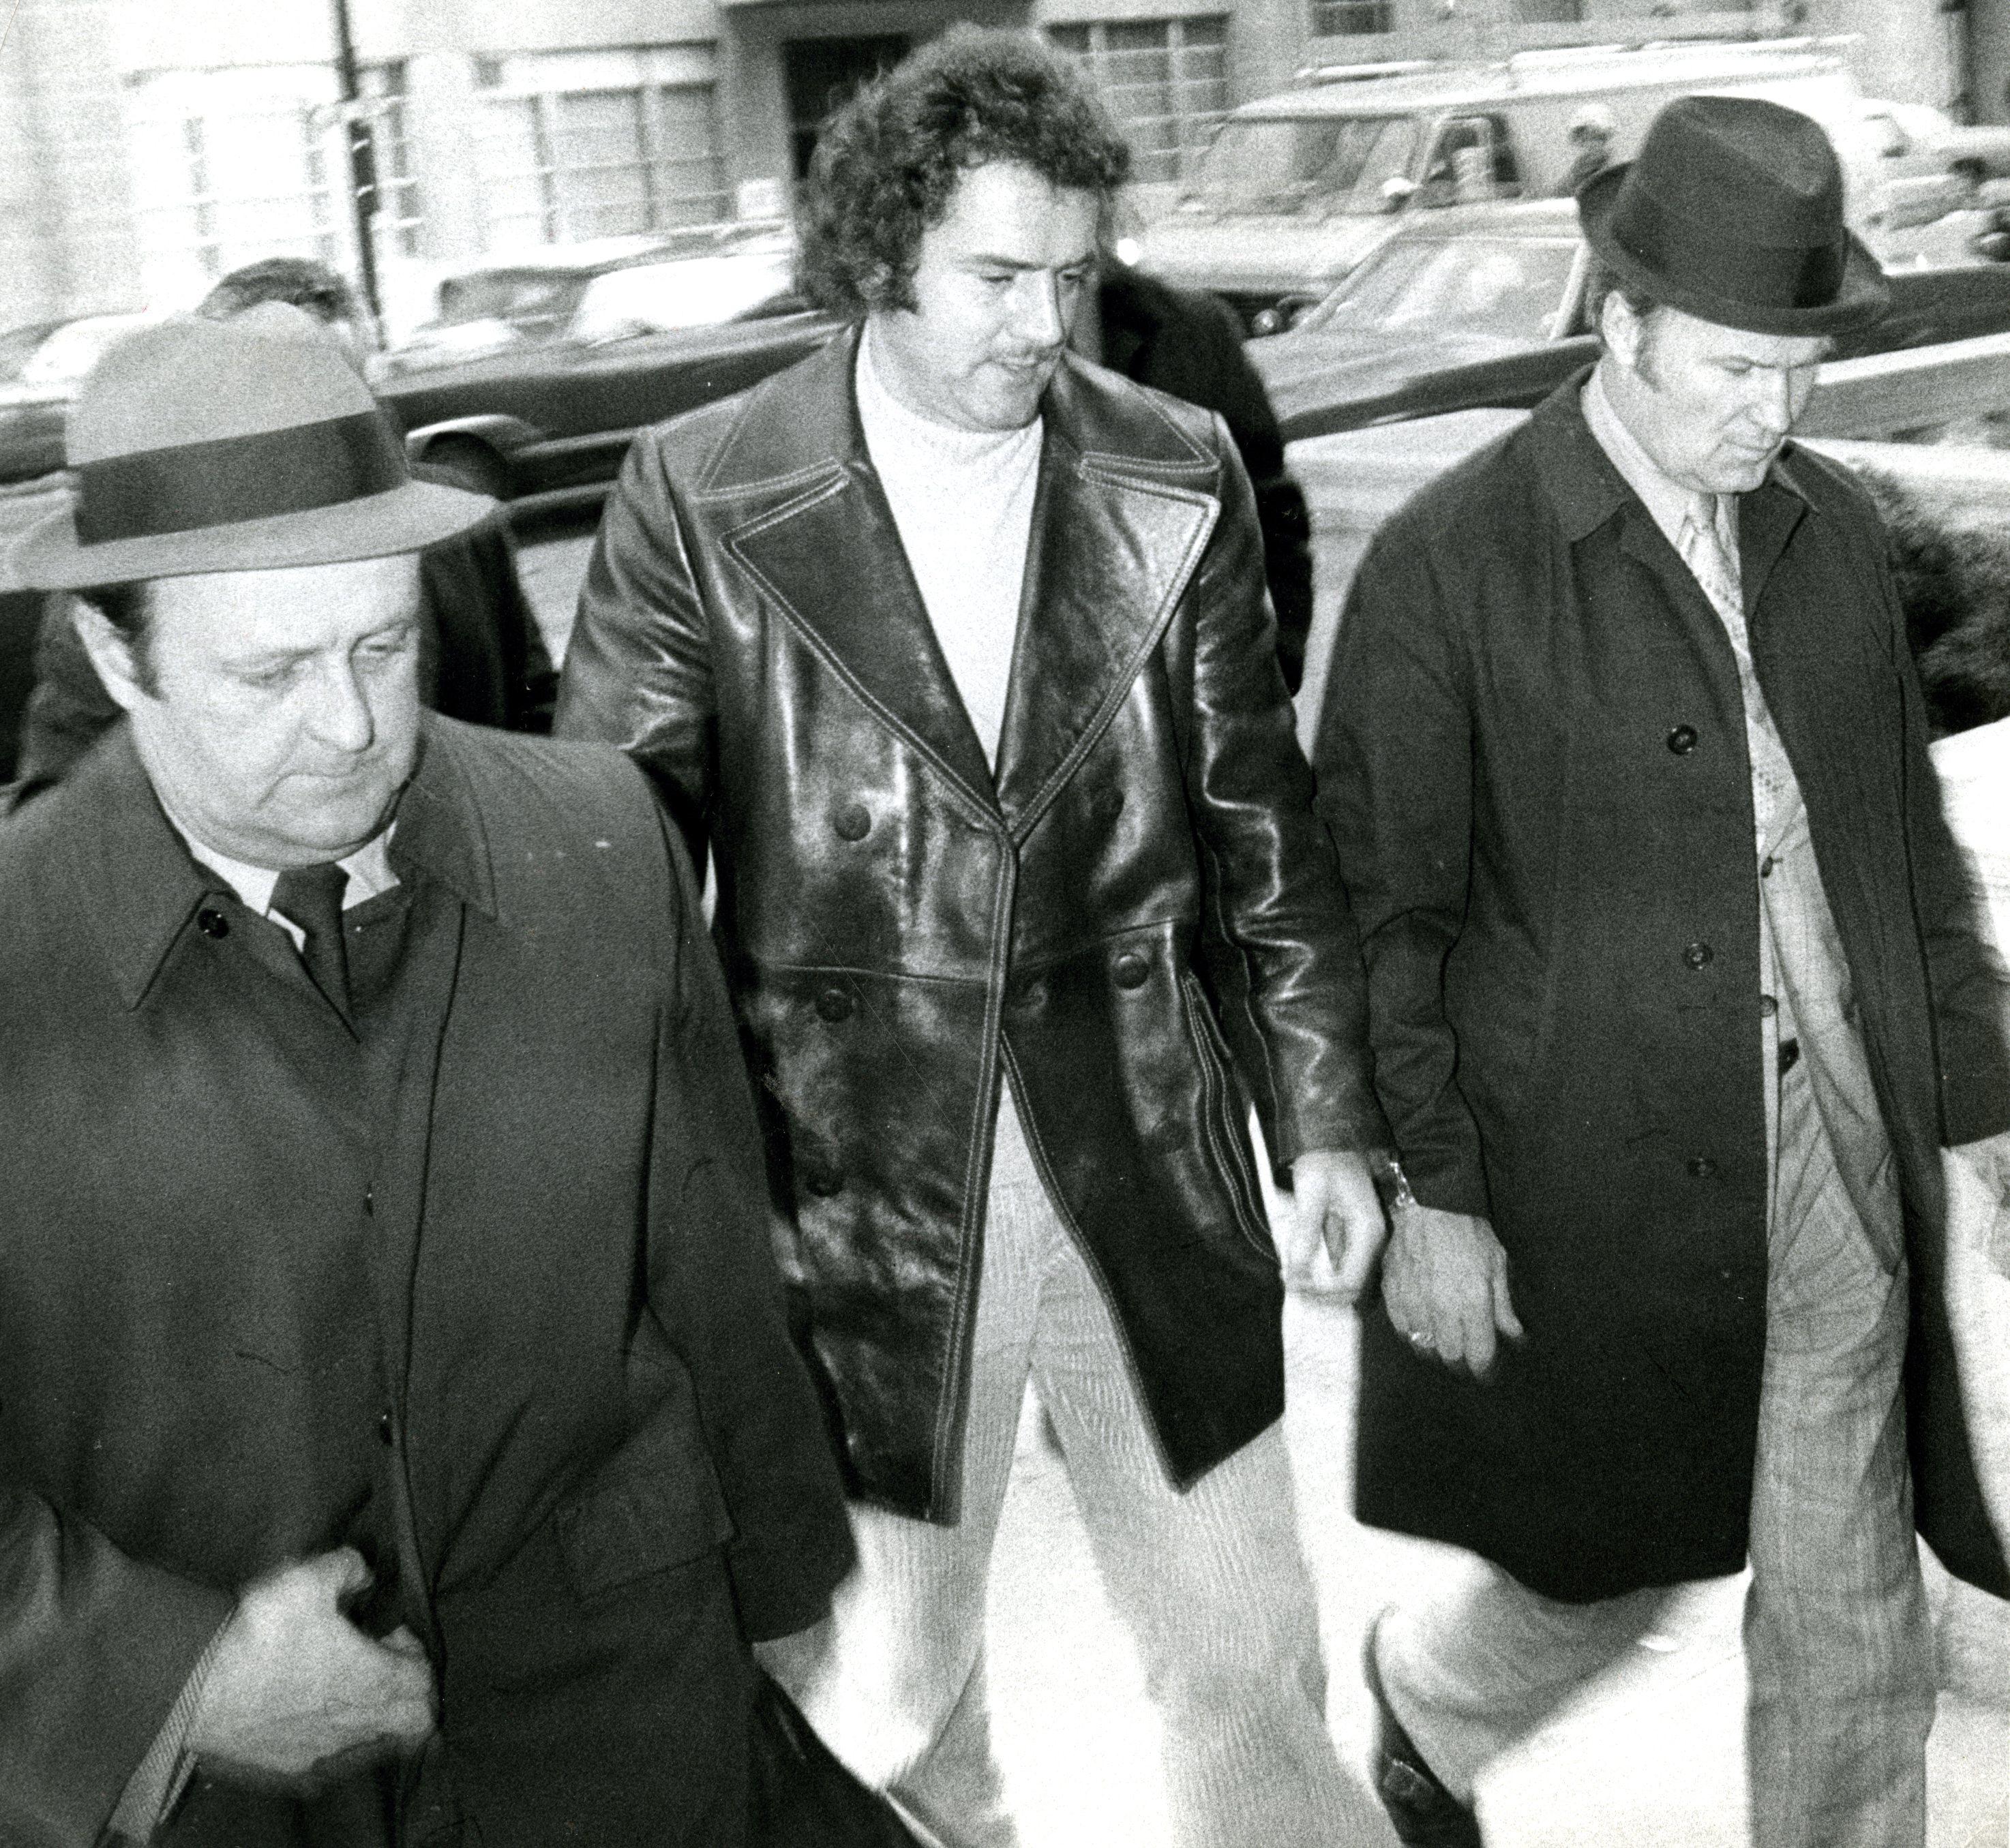 Mobster: Mafia boss said 'make sure you've got a hole dug' before